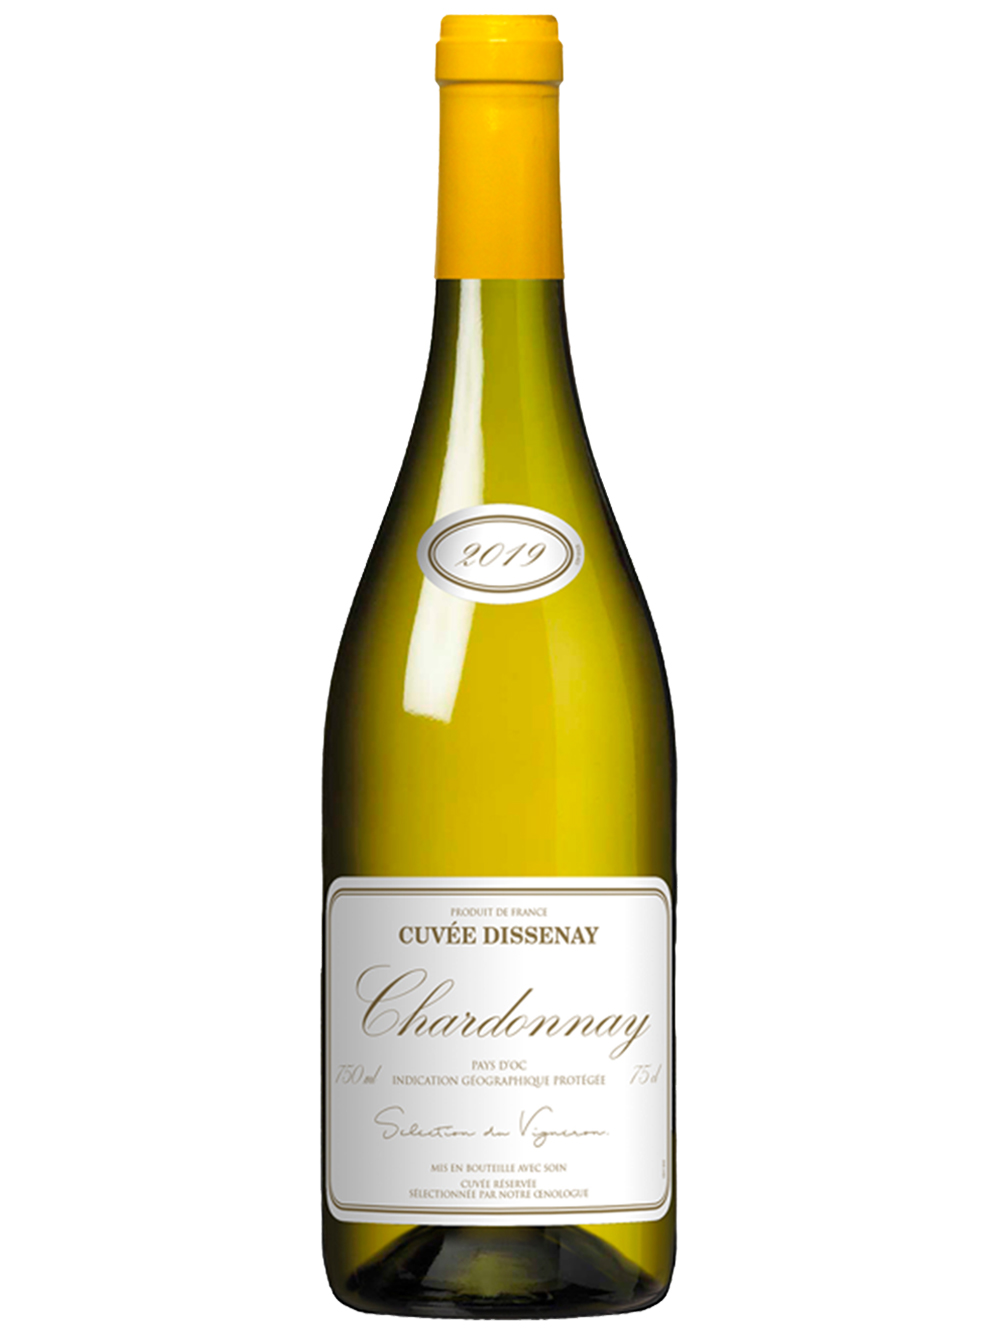 Cuvée Dissenay Chardonnay